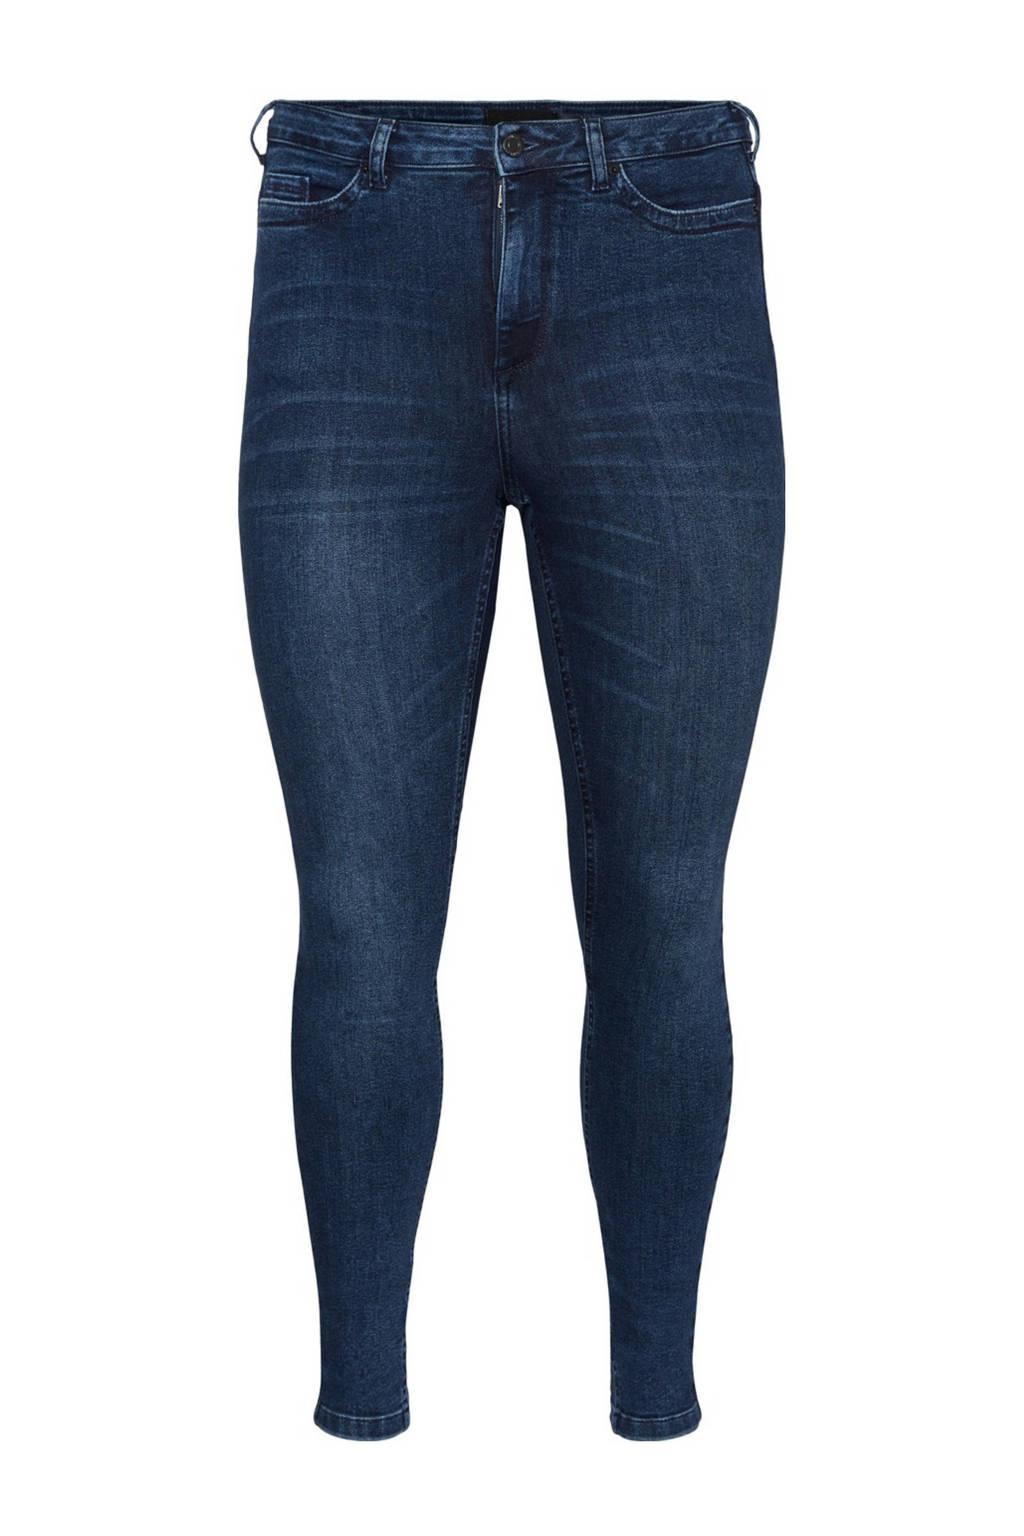 VERO MODA CURVE high waist skinny jeans VMLORAEMILIE donkerblauw, Donkerblauw